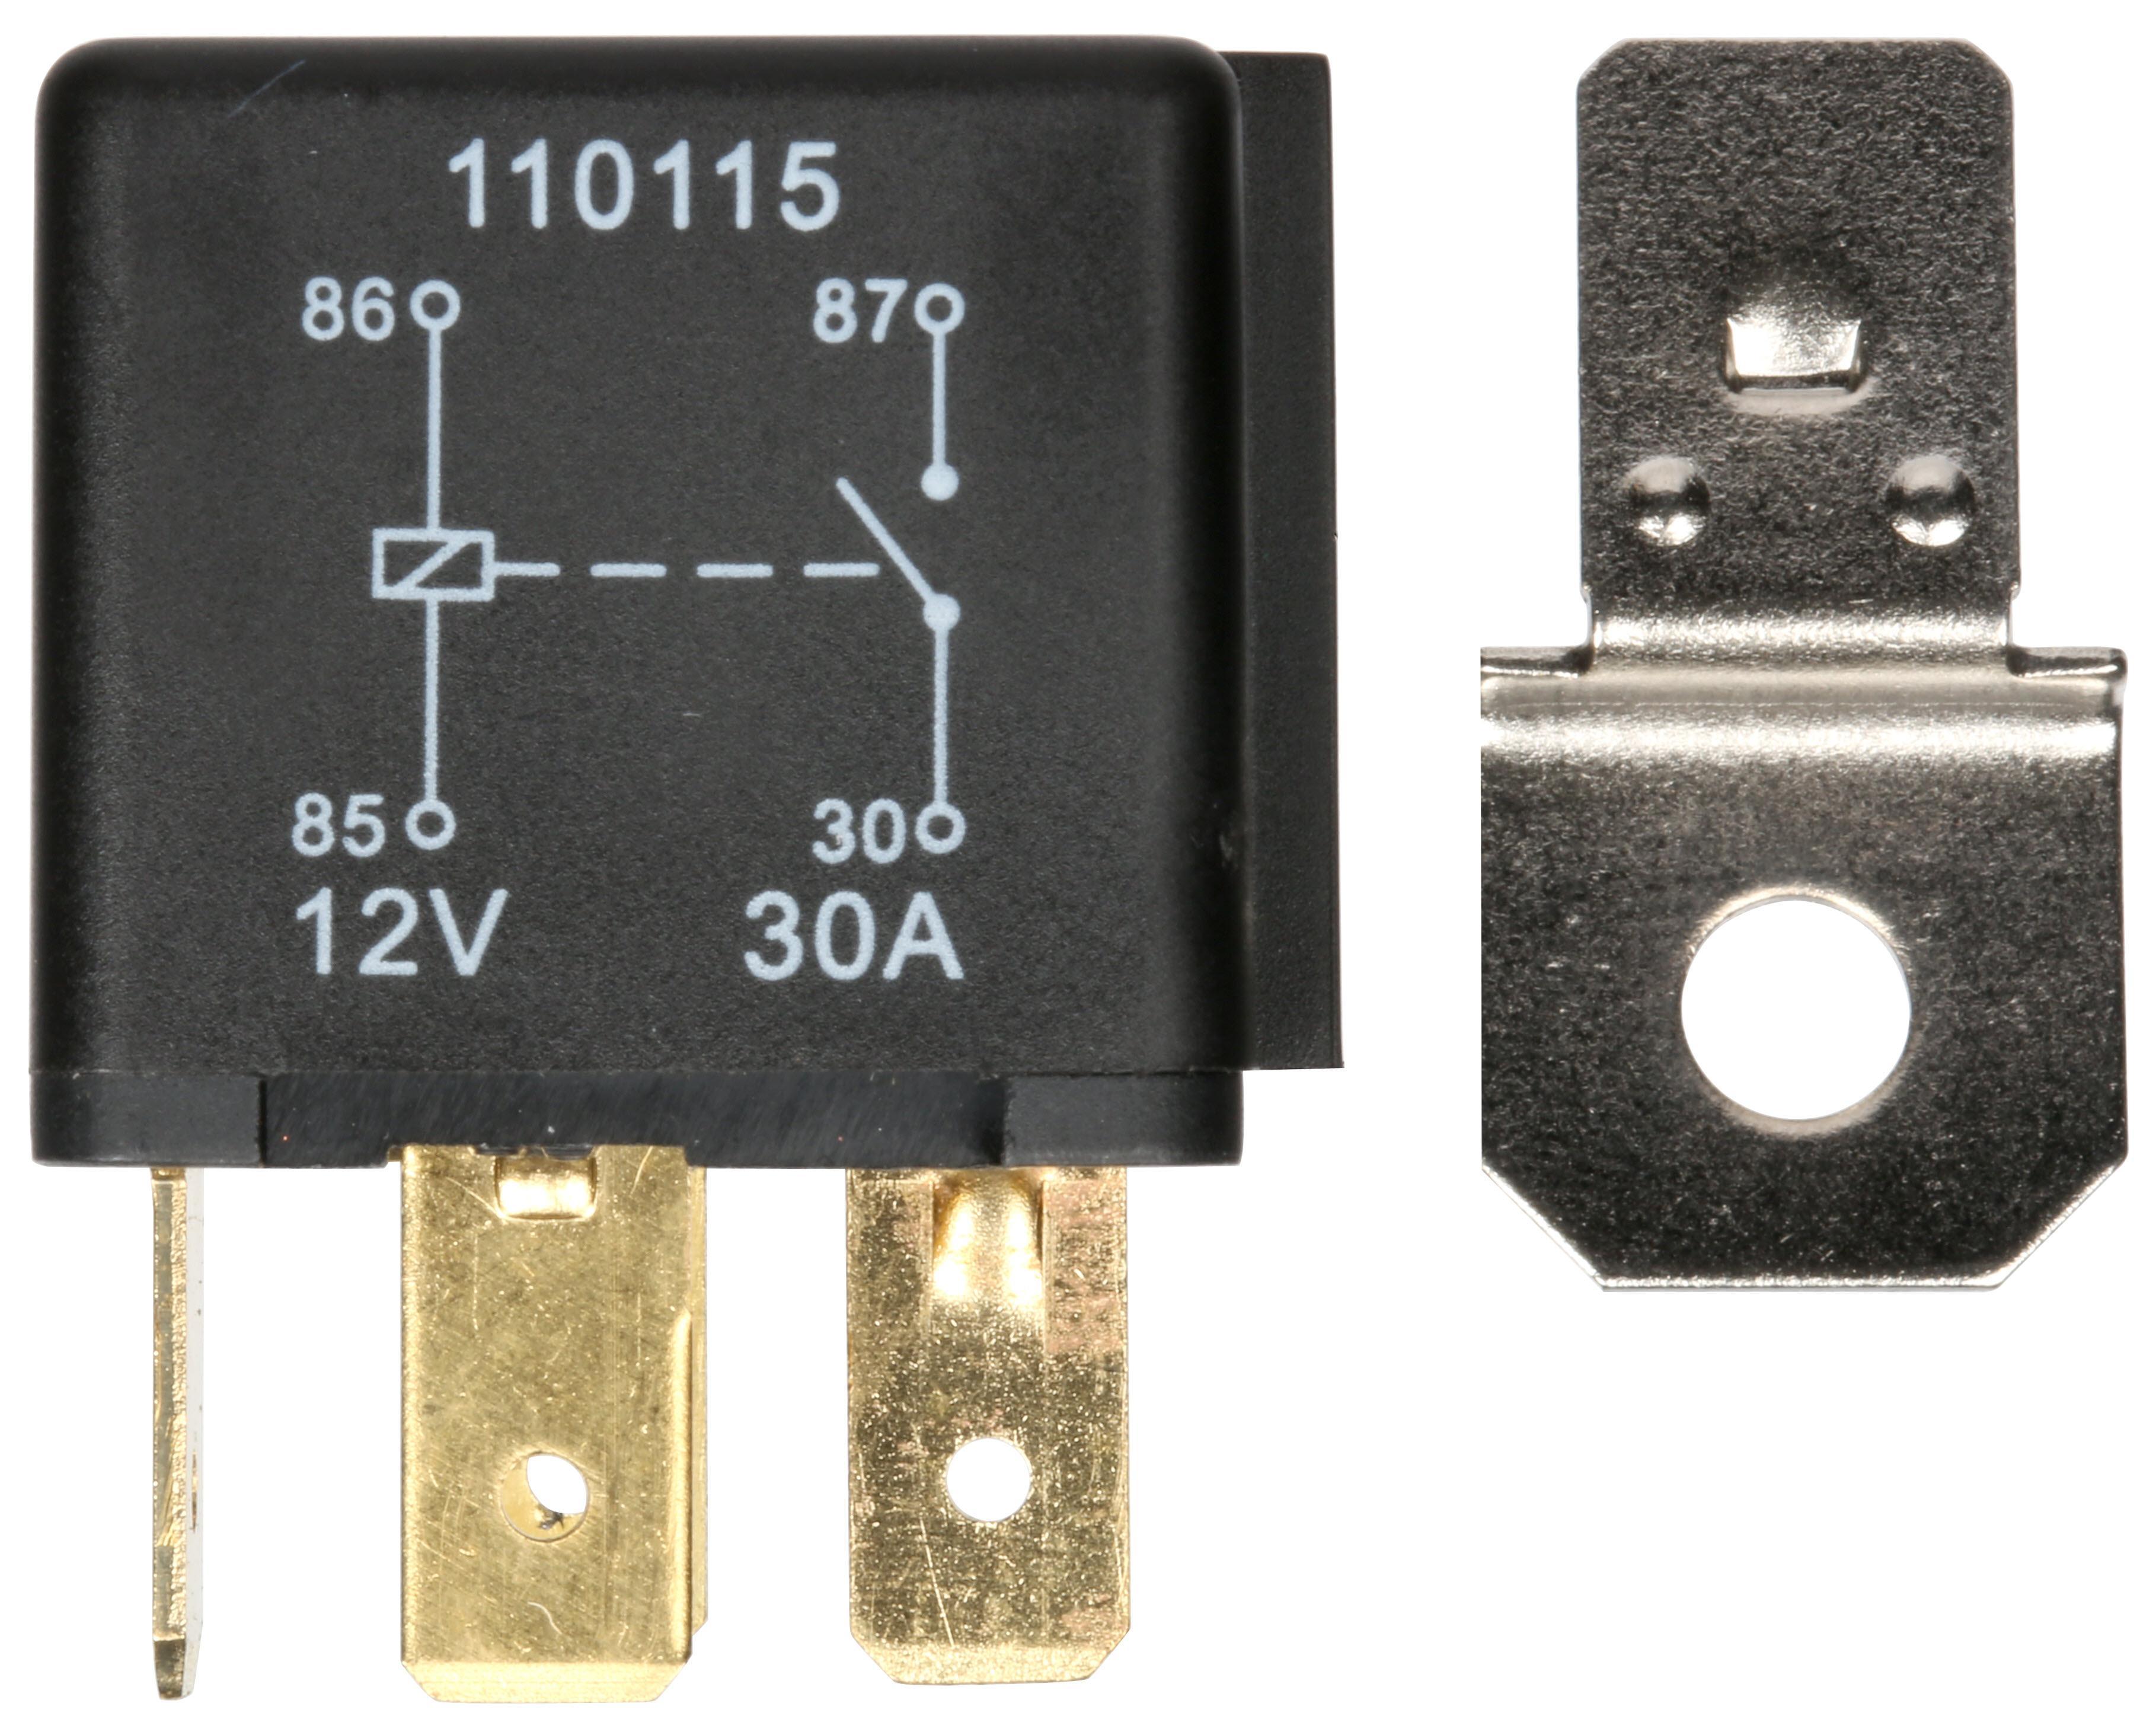 12v Fuse Box Halfords Circuit Connection Diagram Dc For Camper Hef554 Relay 30amp 4 Rh Com Block Panel